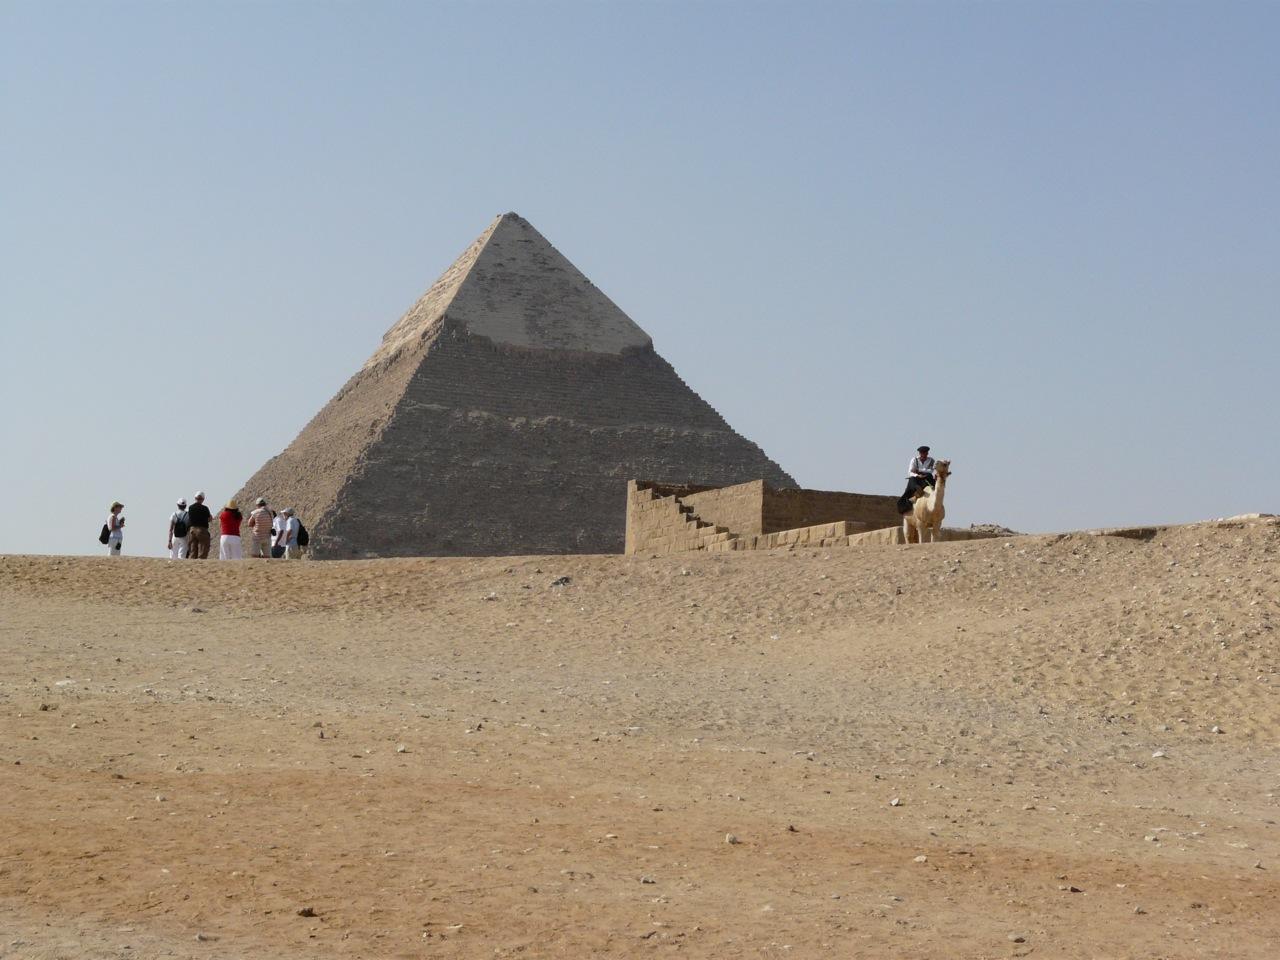 Площадь перед пирамидой Хефрена, Гиза